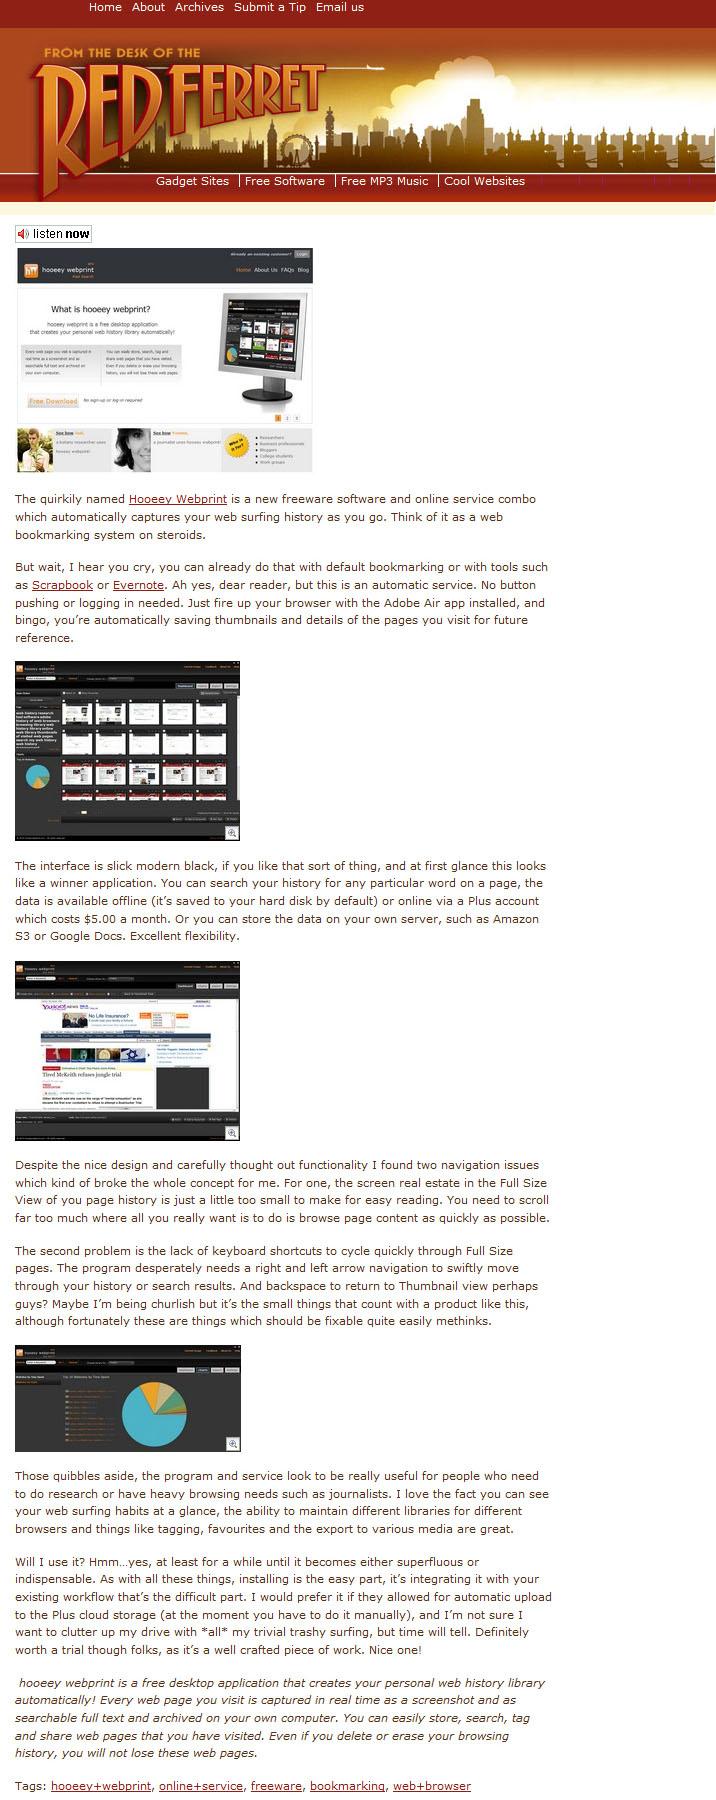 Hooeey webprint homepage for Redferret net